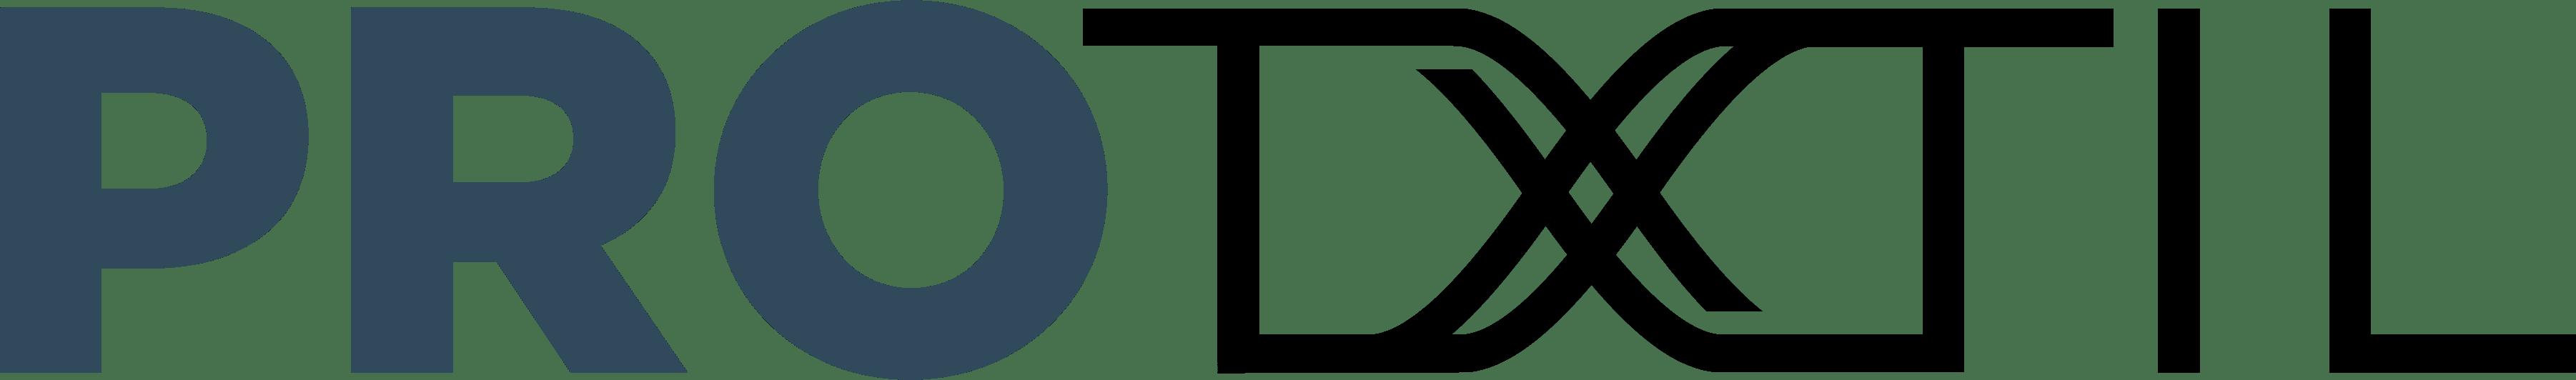 Protxtil: CHF 10.-Rabatt auf das ganze Sortiment (MBW: 99.-)